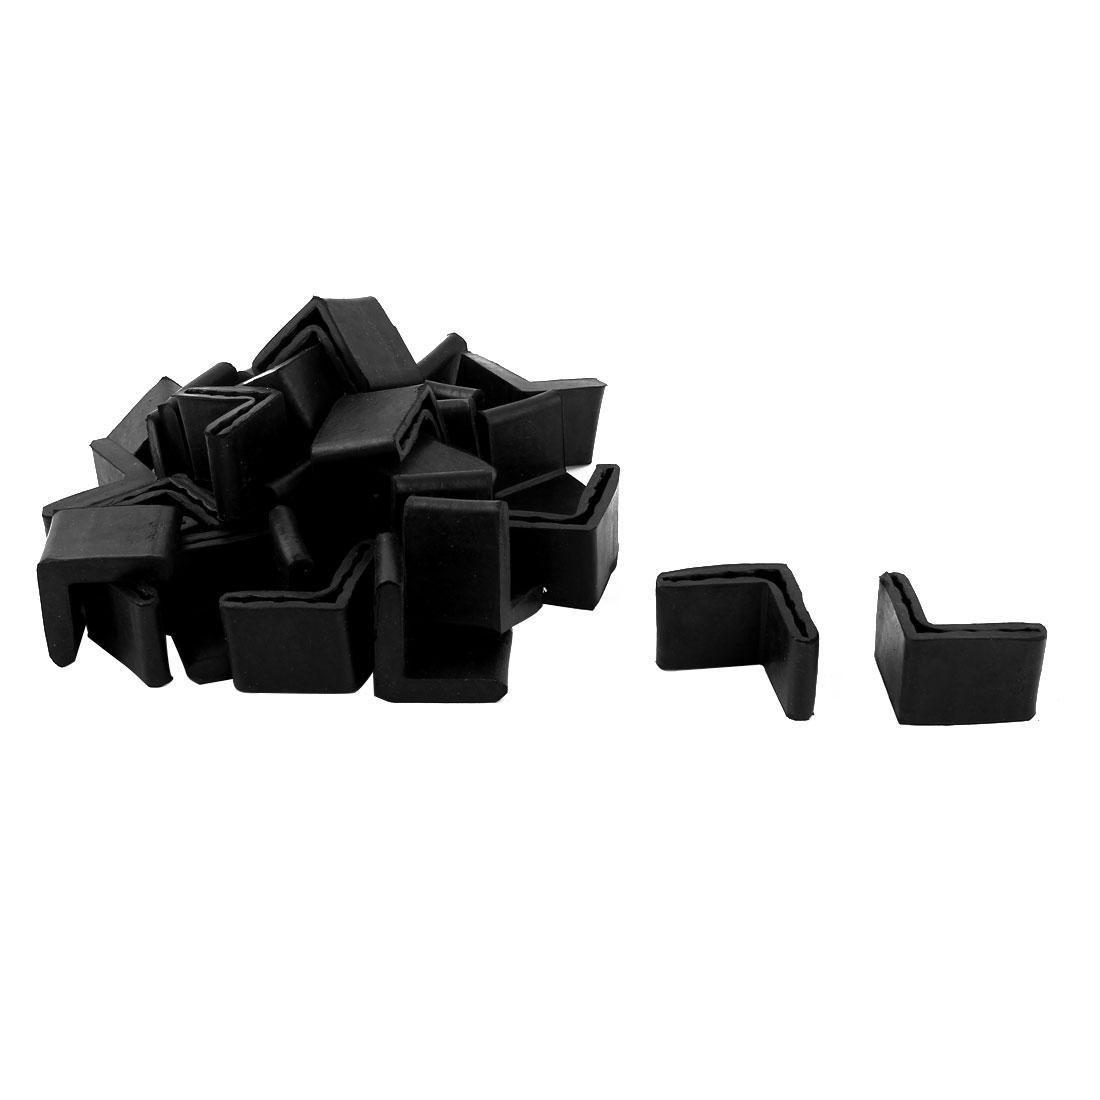 Office Rubber L Shape Furniture Foot Anti-slip Cover Black 35mm x 35mm 29 Pcs